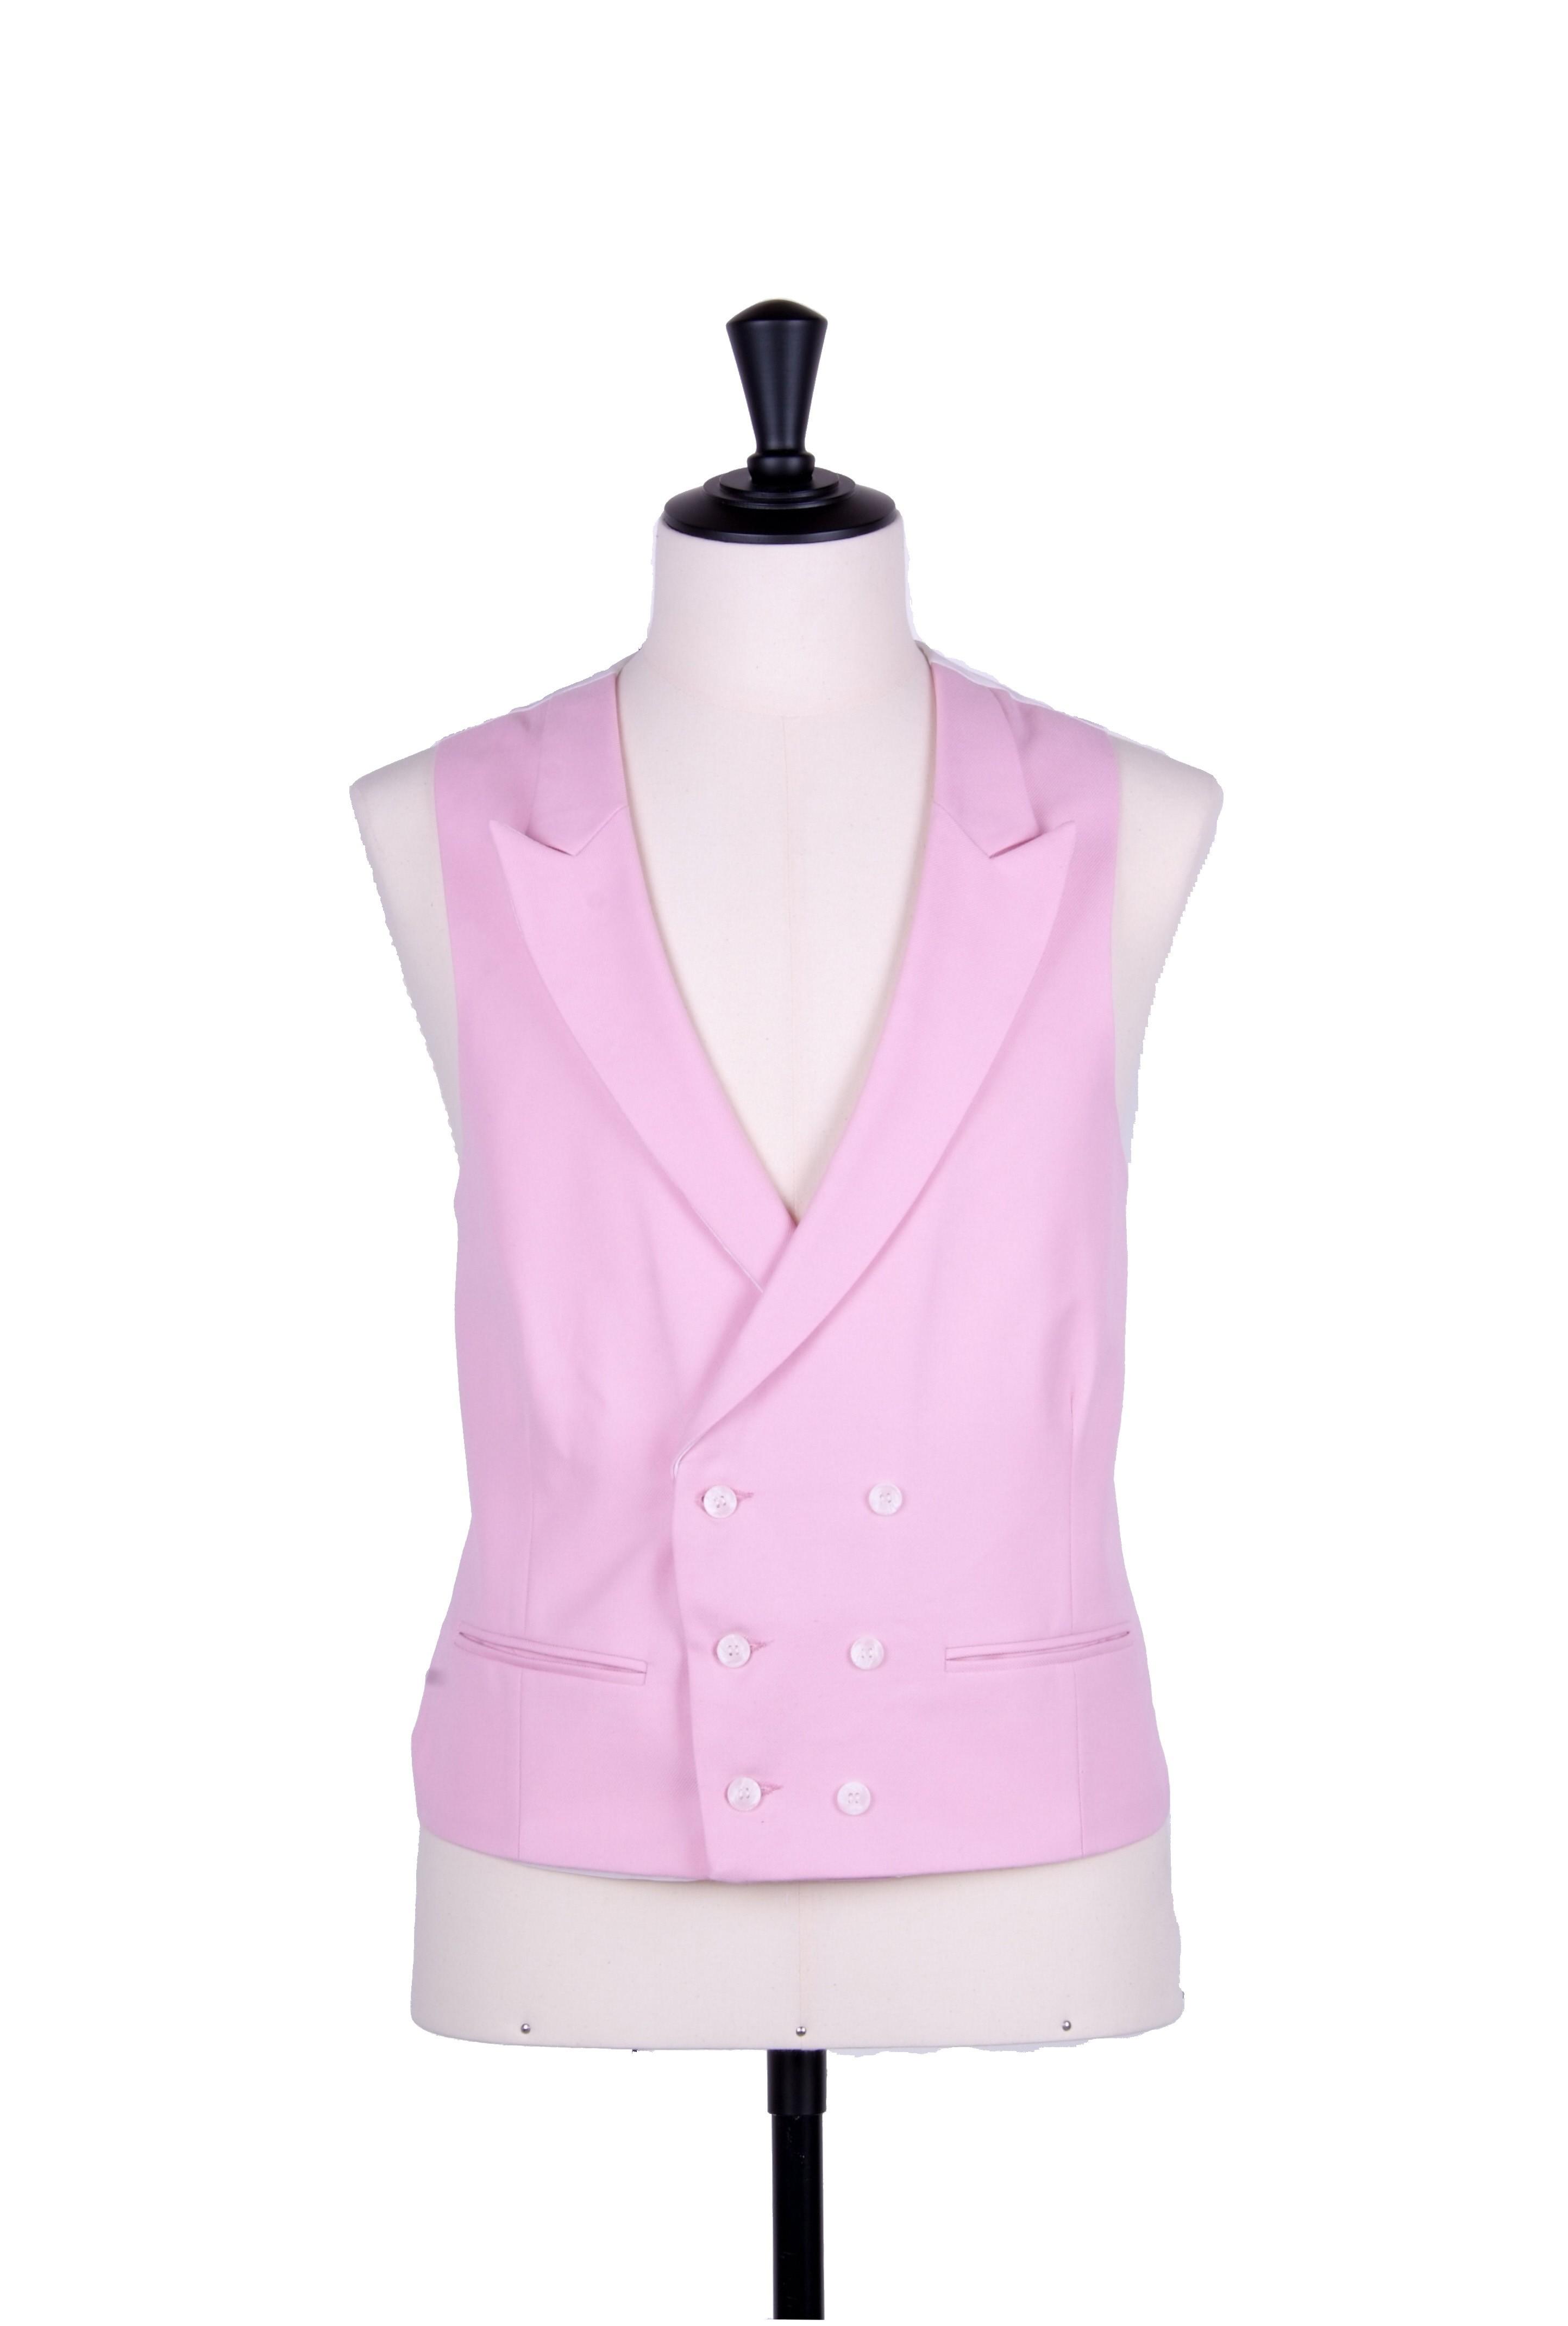 Ascot Pink Wedding Waistcoat Db Anthony Formal Wear